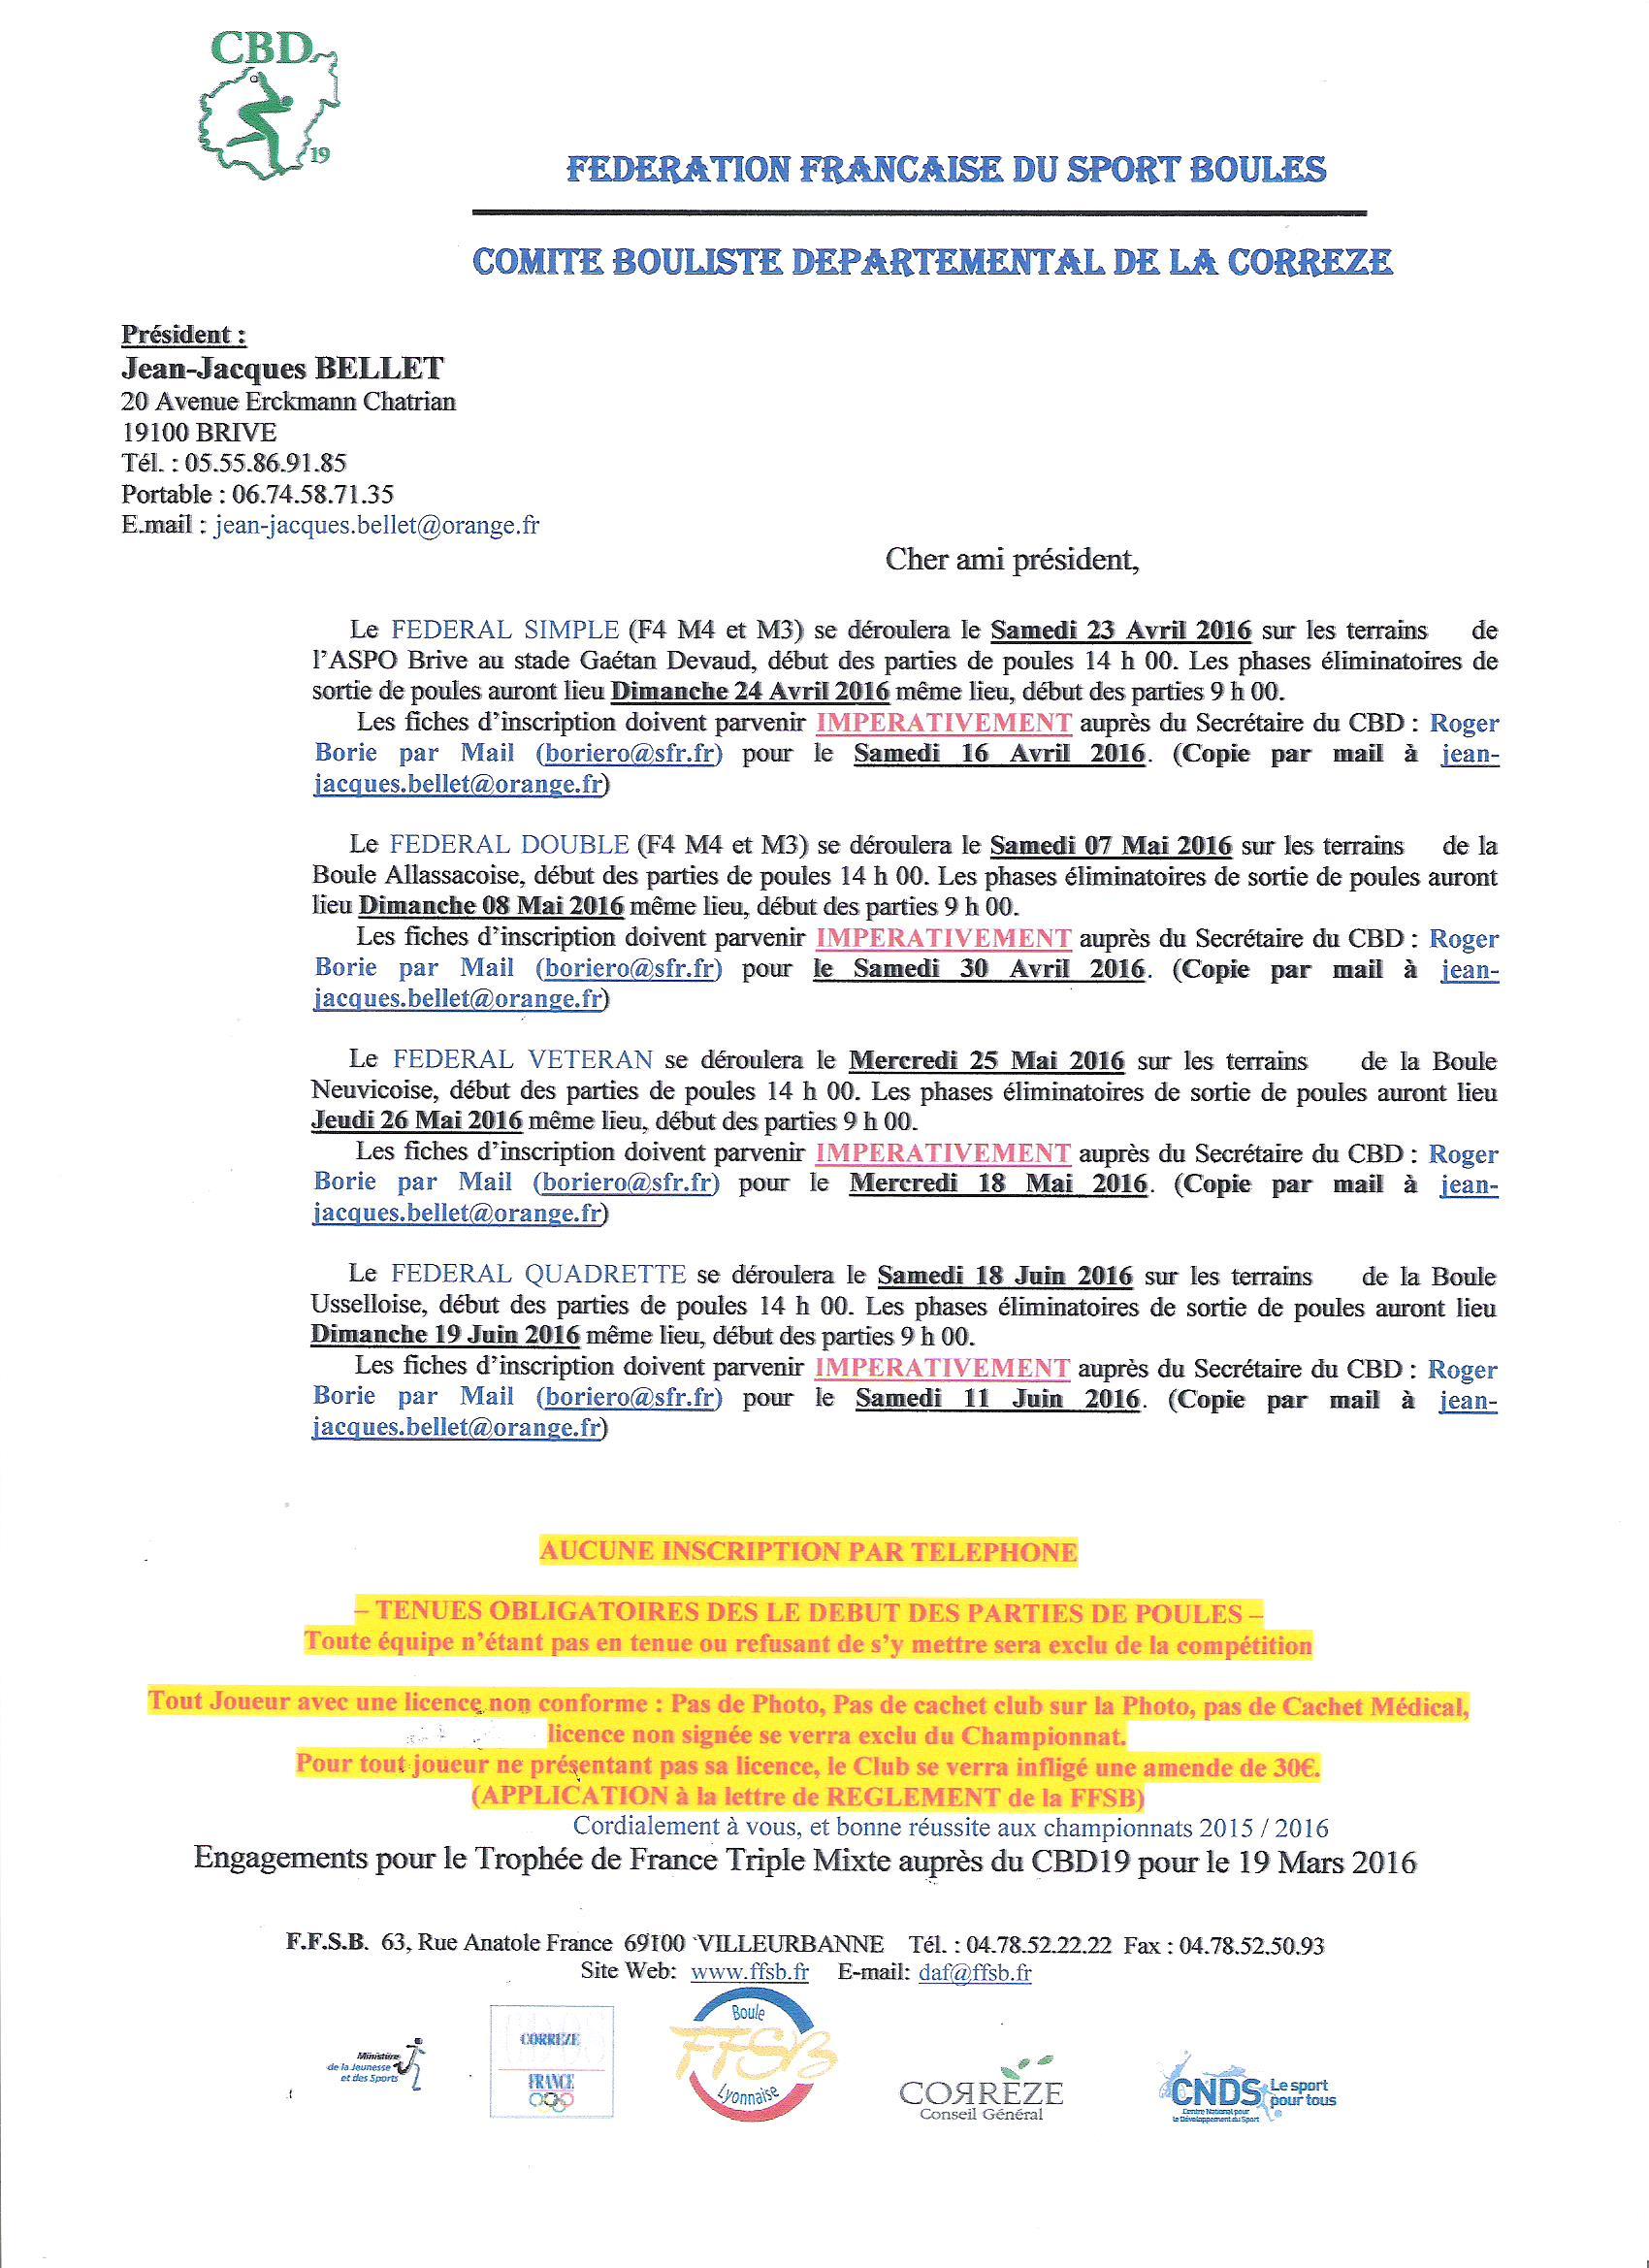 cbd lettre federaux 001.jpg